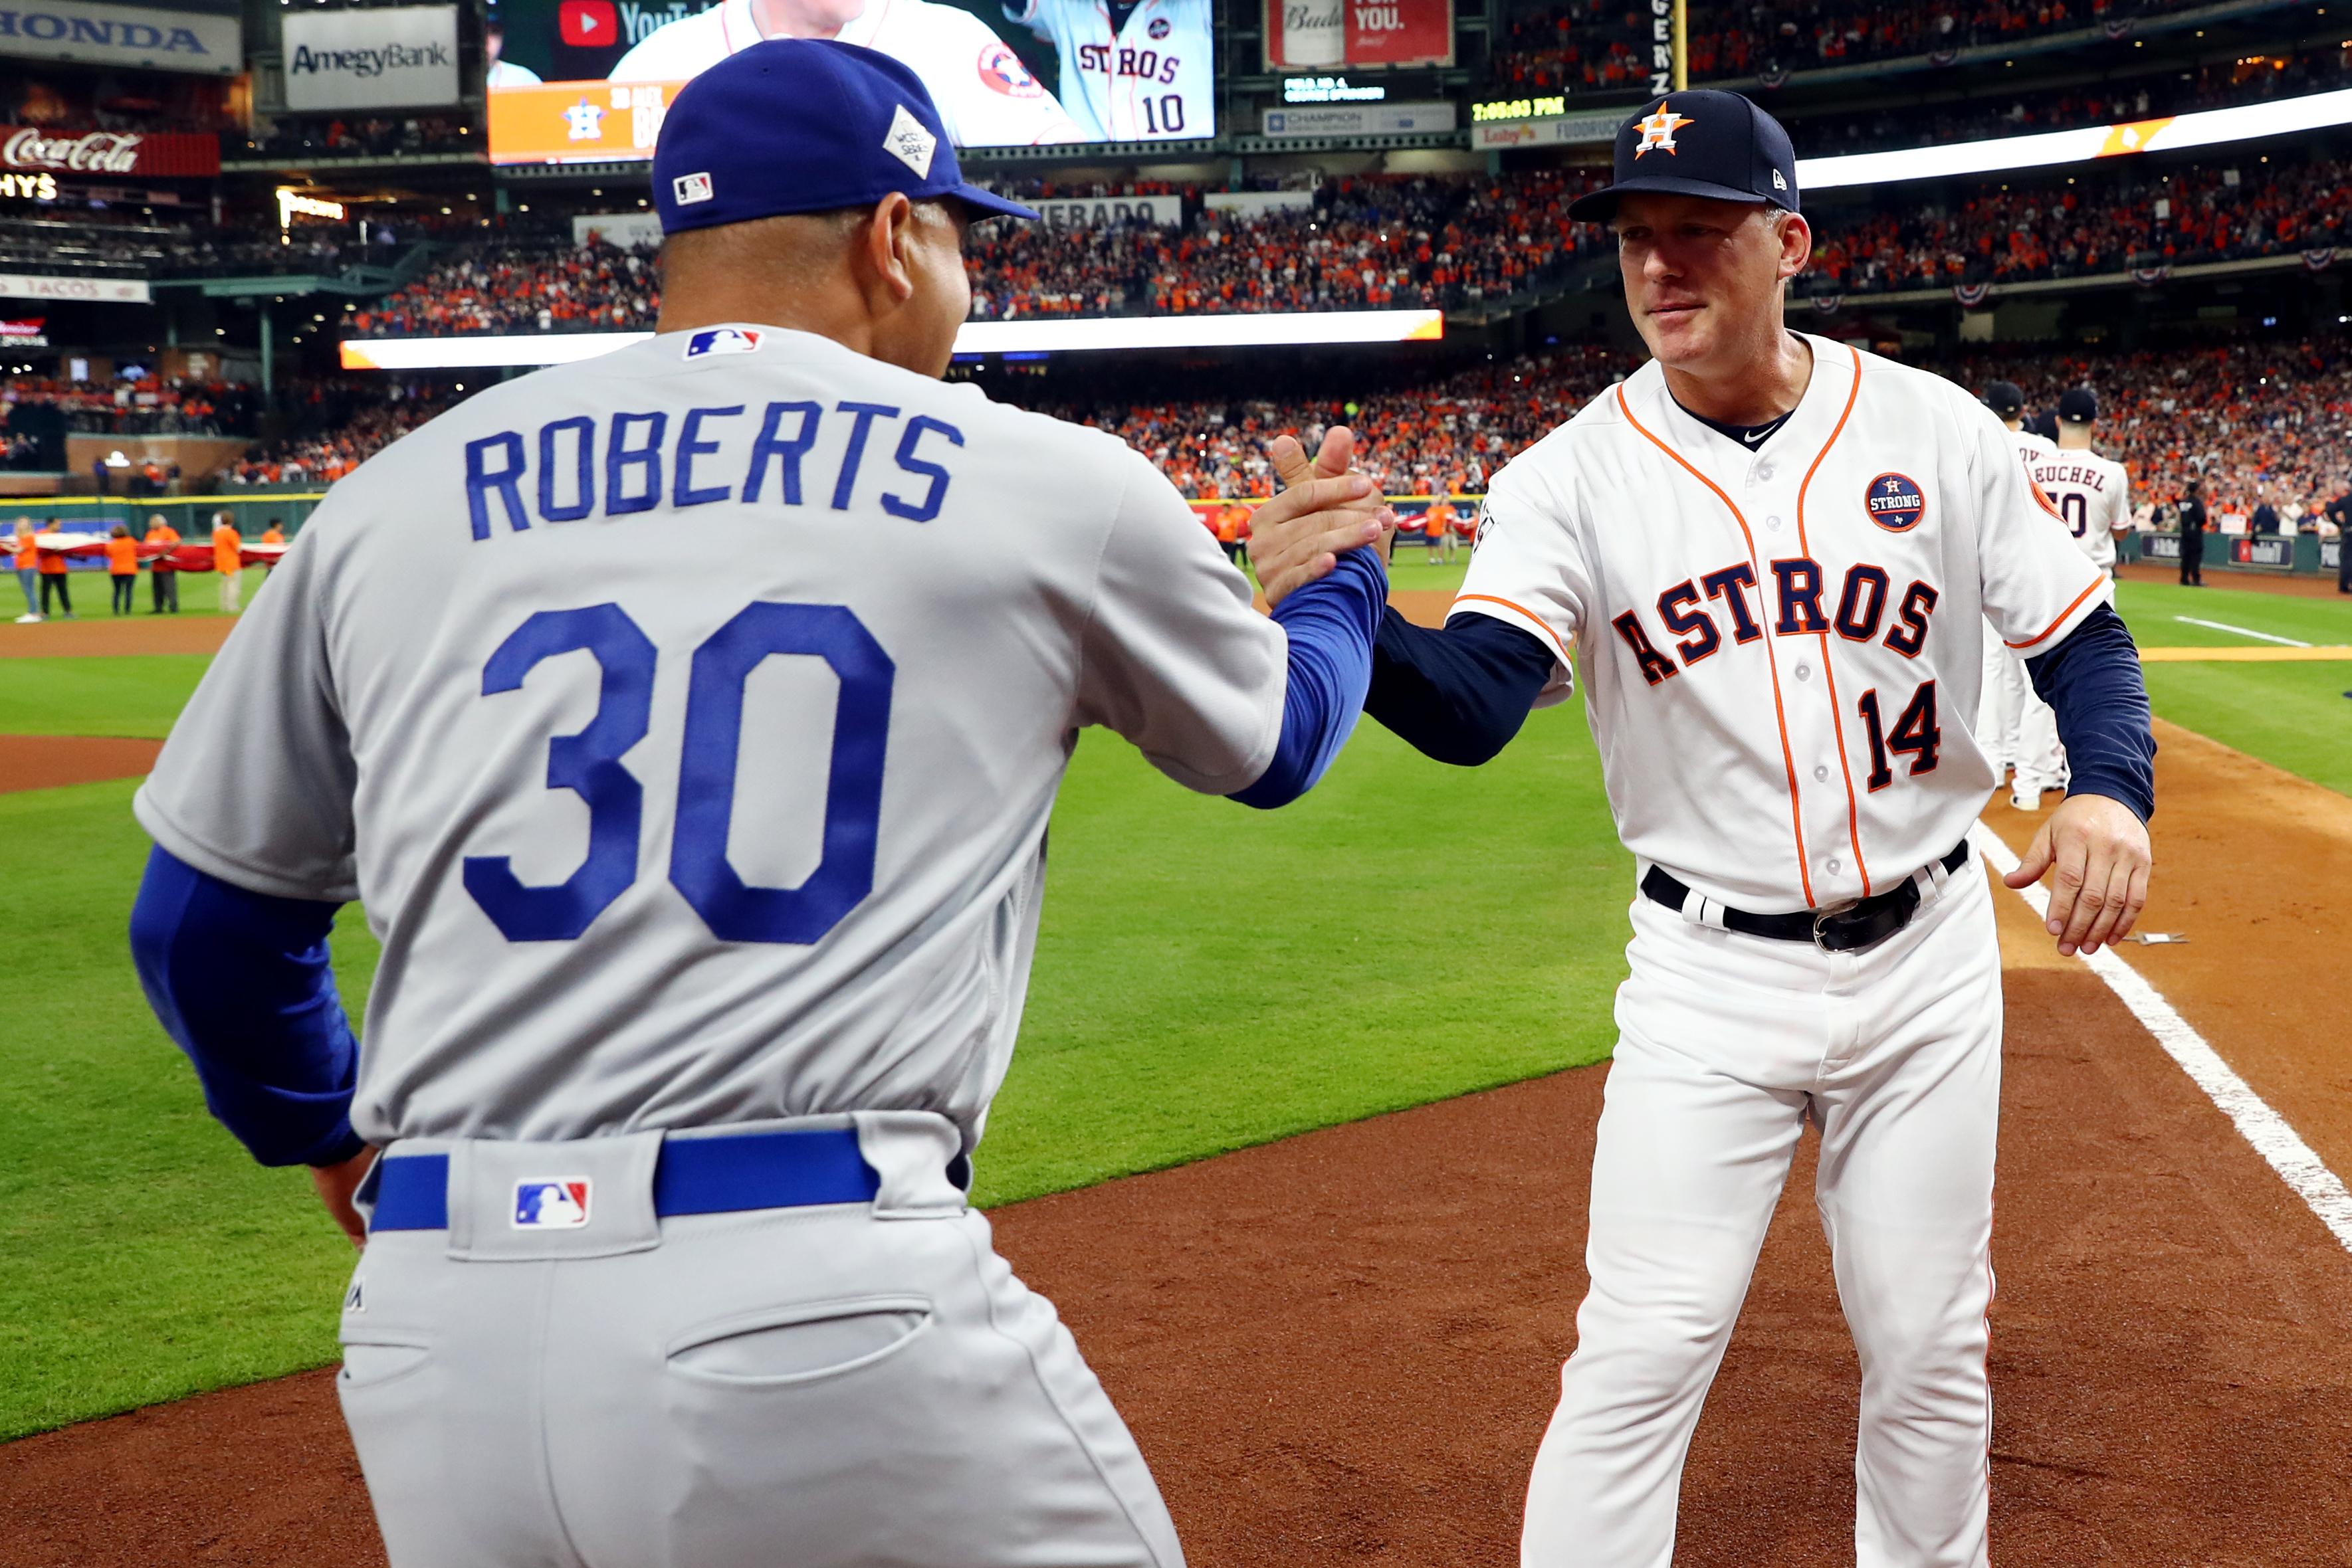 2017 Major League Baseball World Series Game Three: Los Angeles Dodgers v. Houston Astros